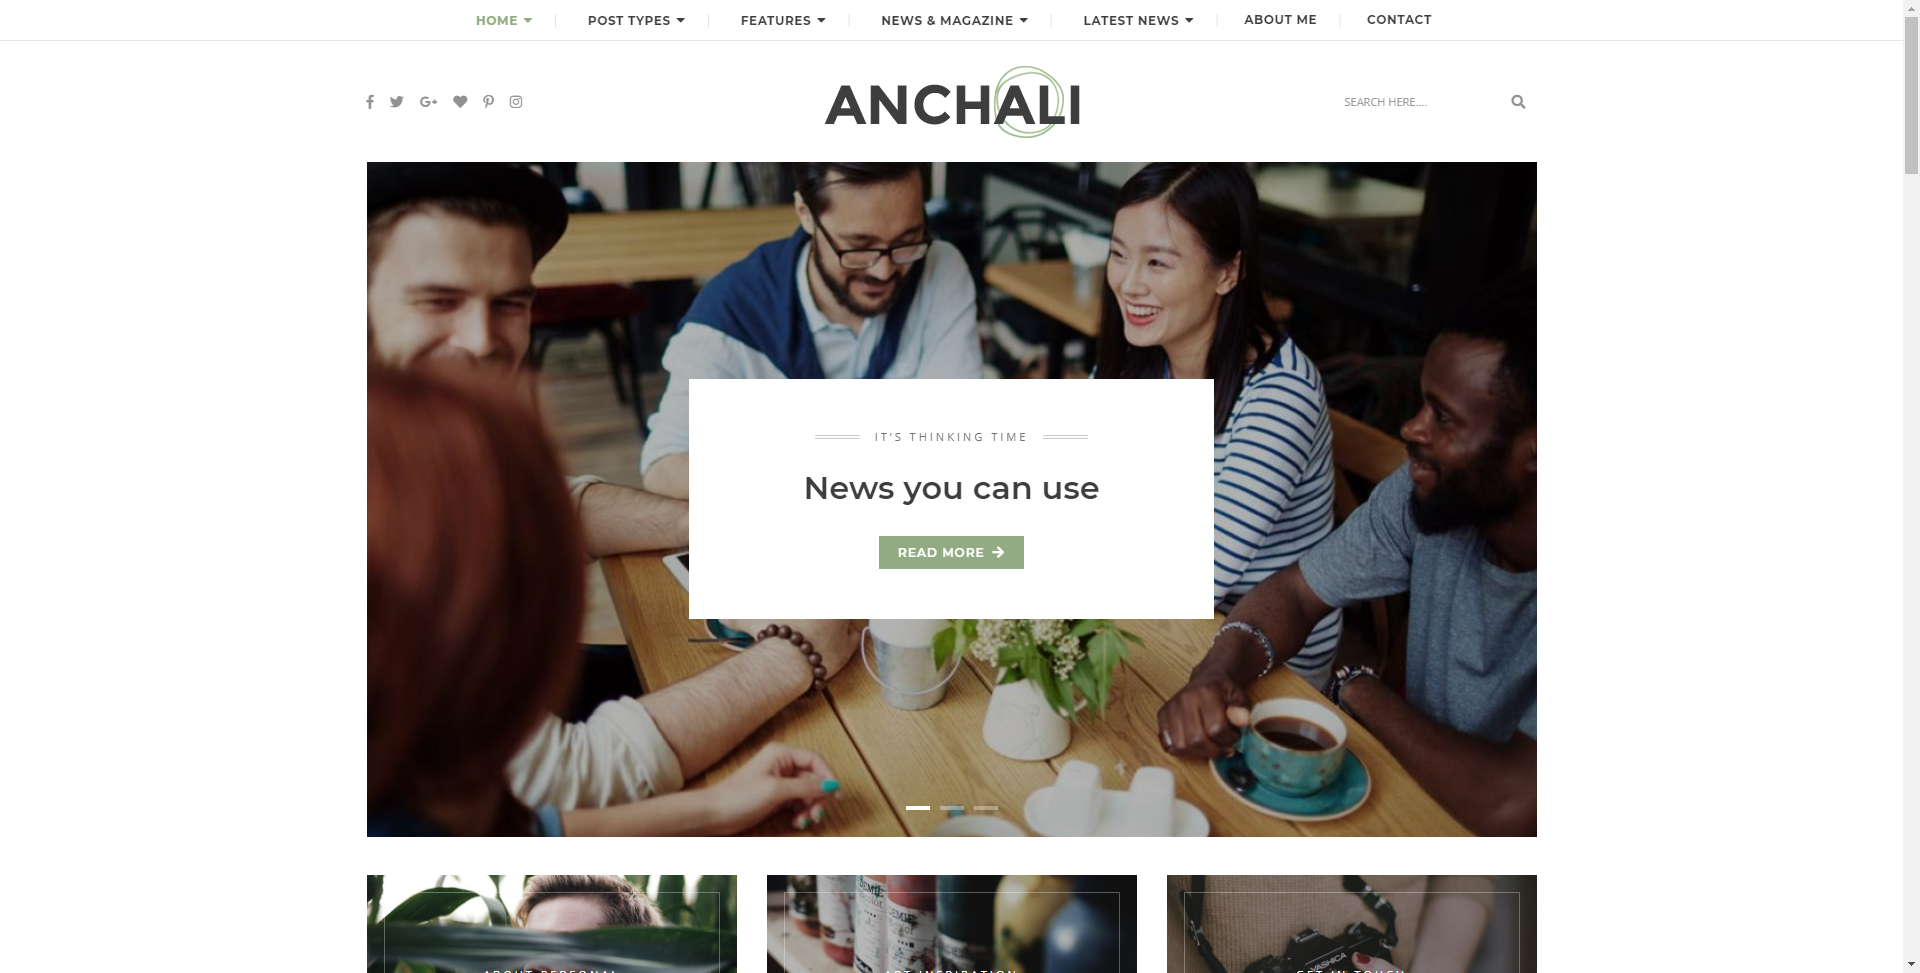 Anchali